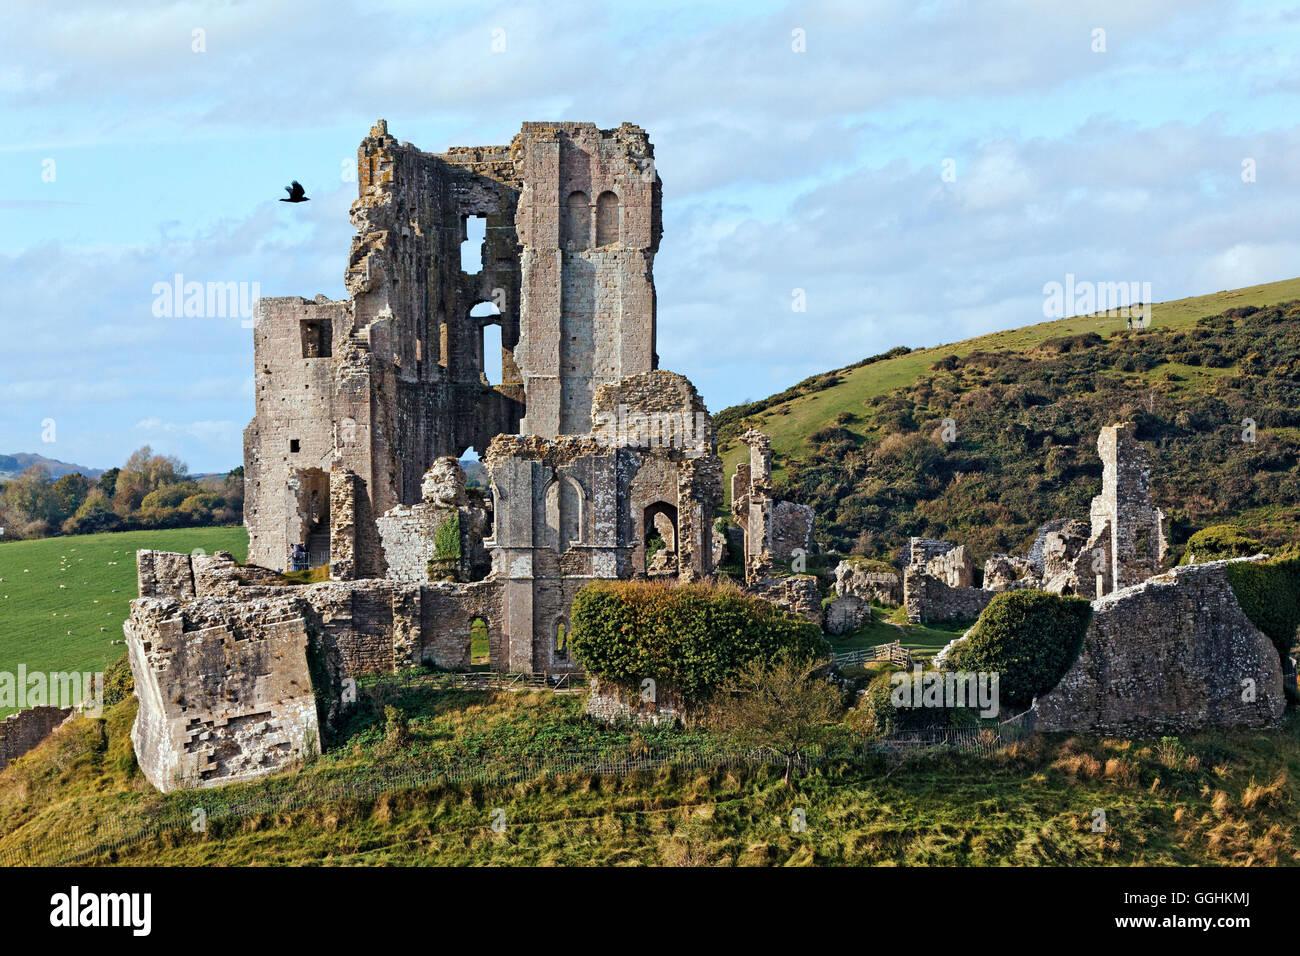 Corfe Castle, Dorset, England, Great Britain - Stock Image